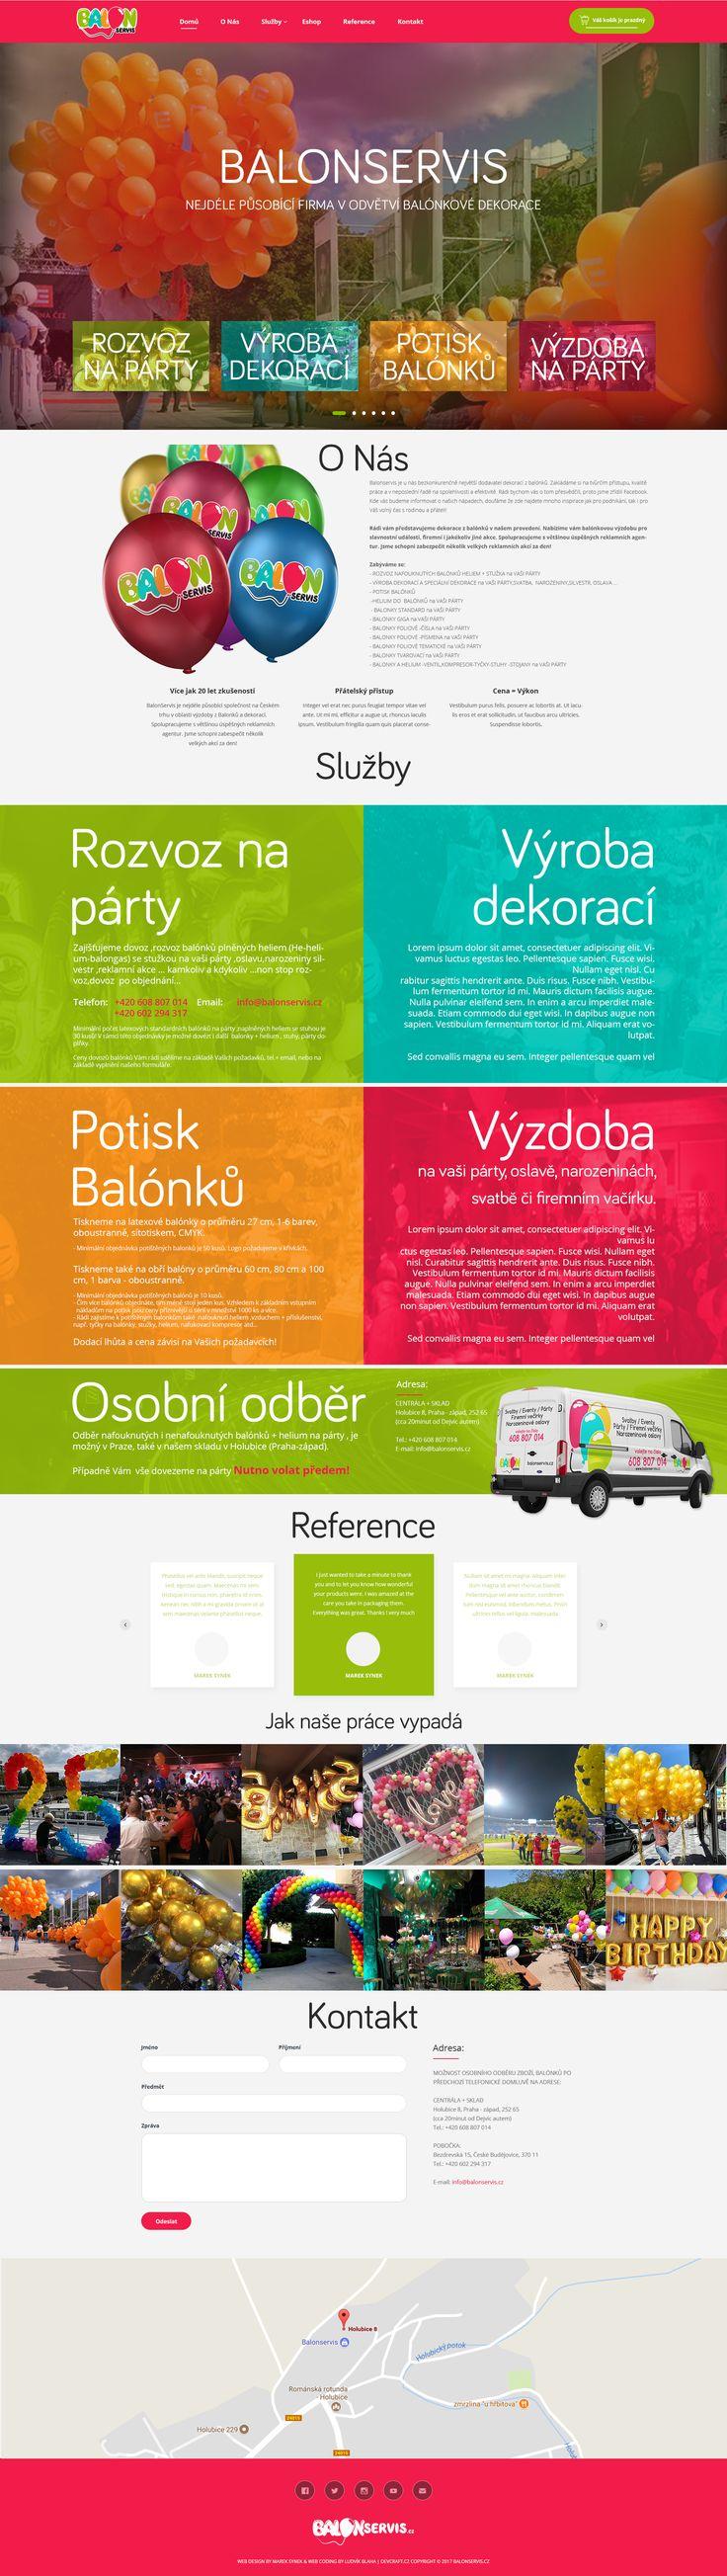 Webdesign for Balonservis.cz